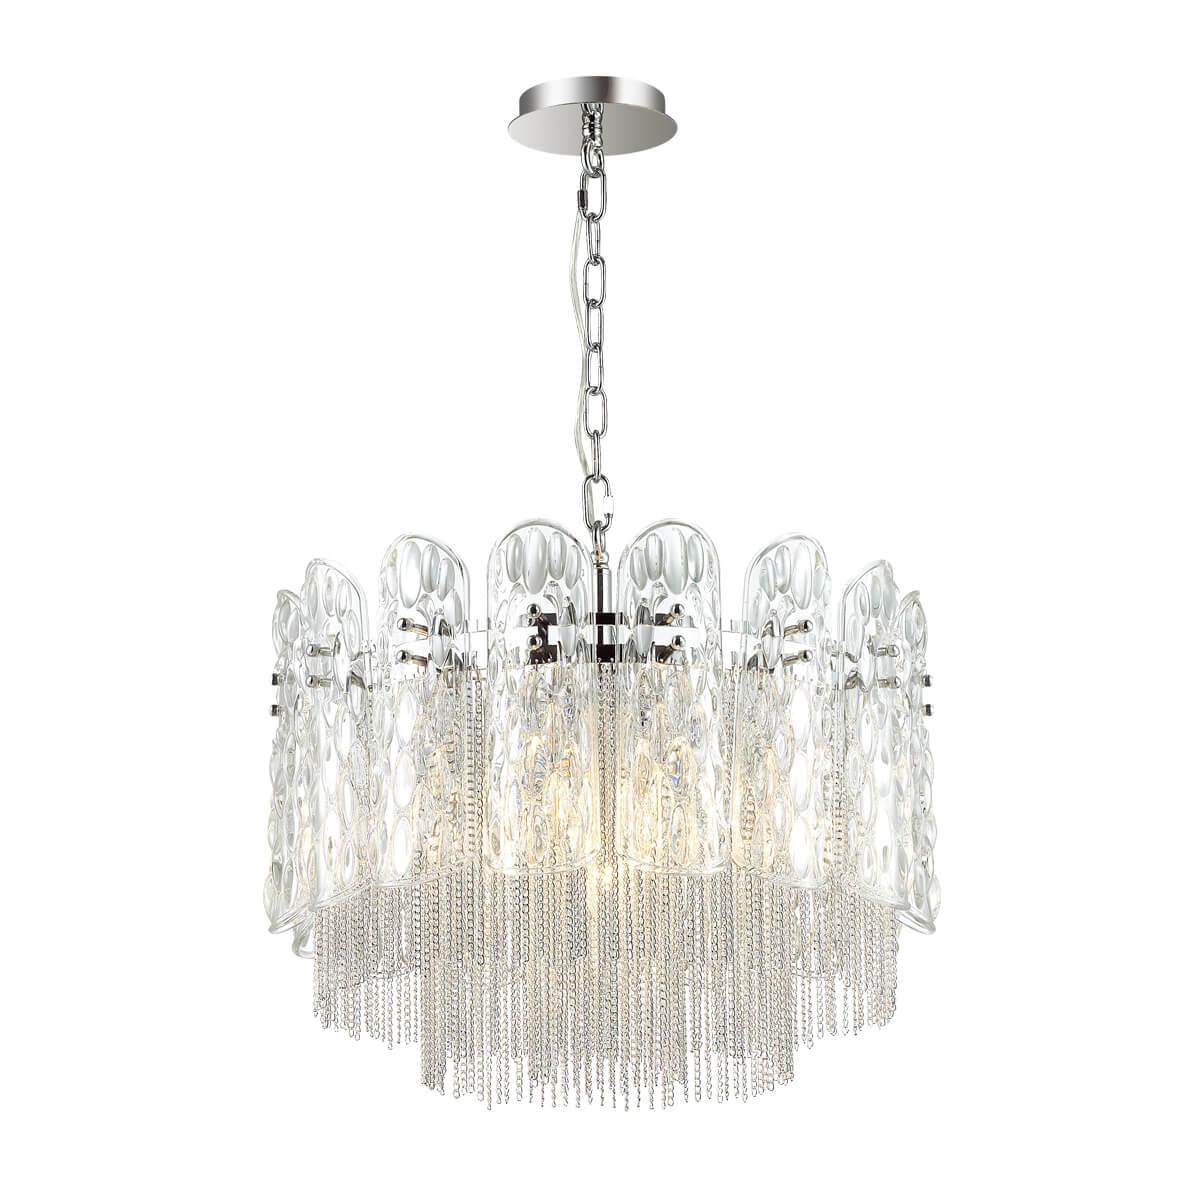 Люстра Odeon Light 4633/6 Classic люстра подвесная odeon light urika 2680 6